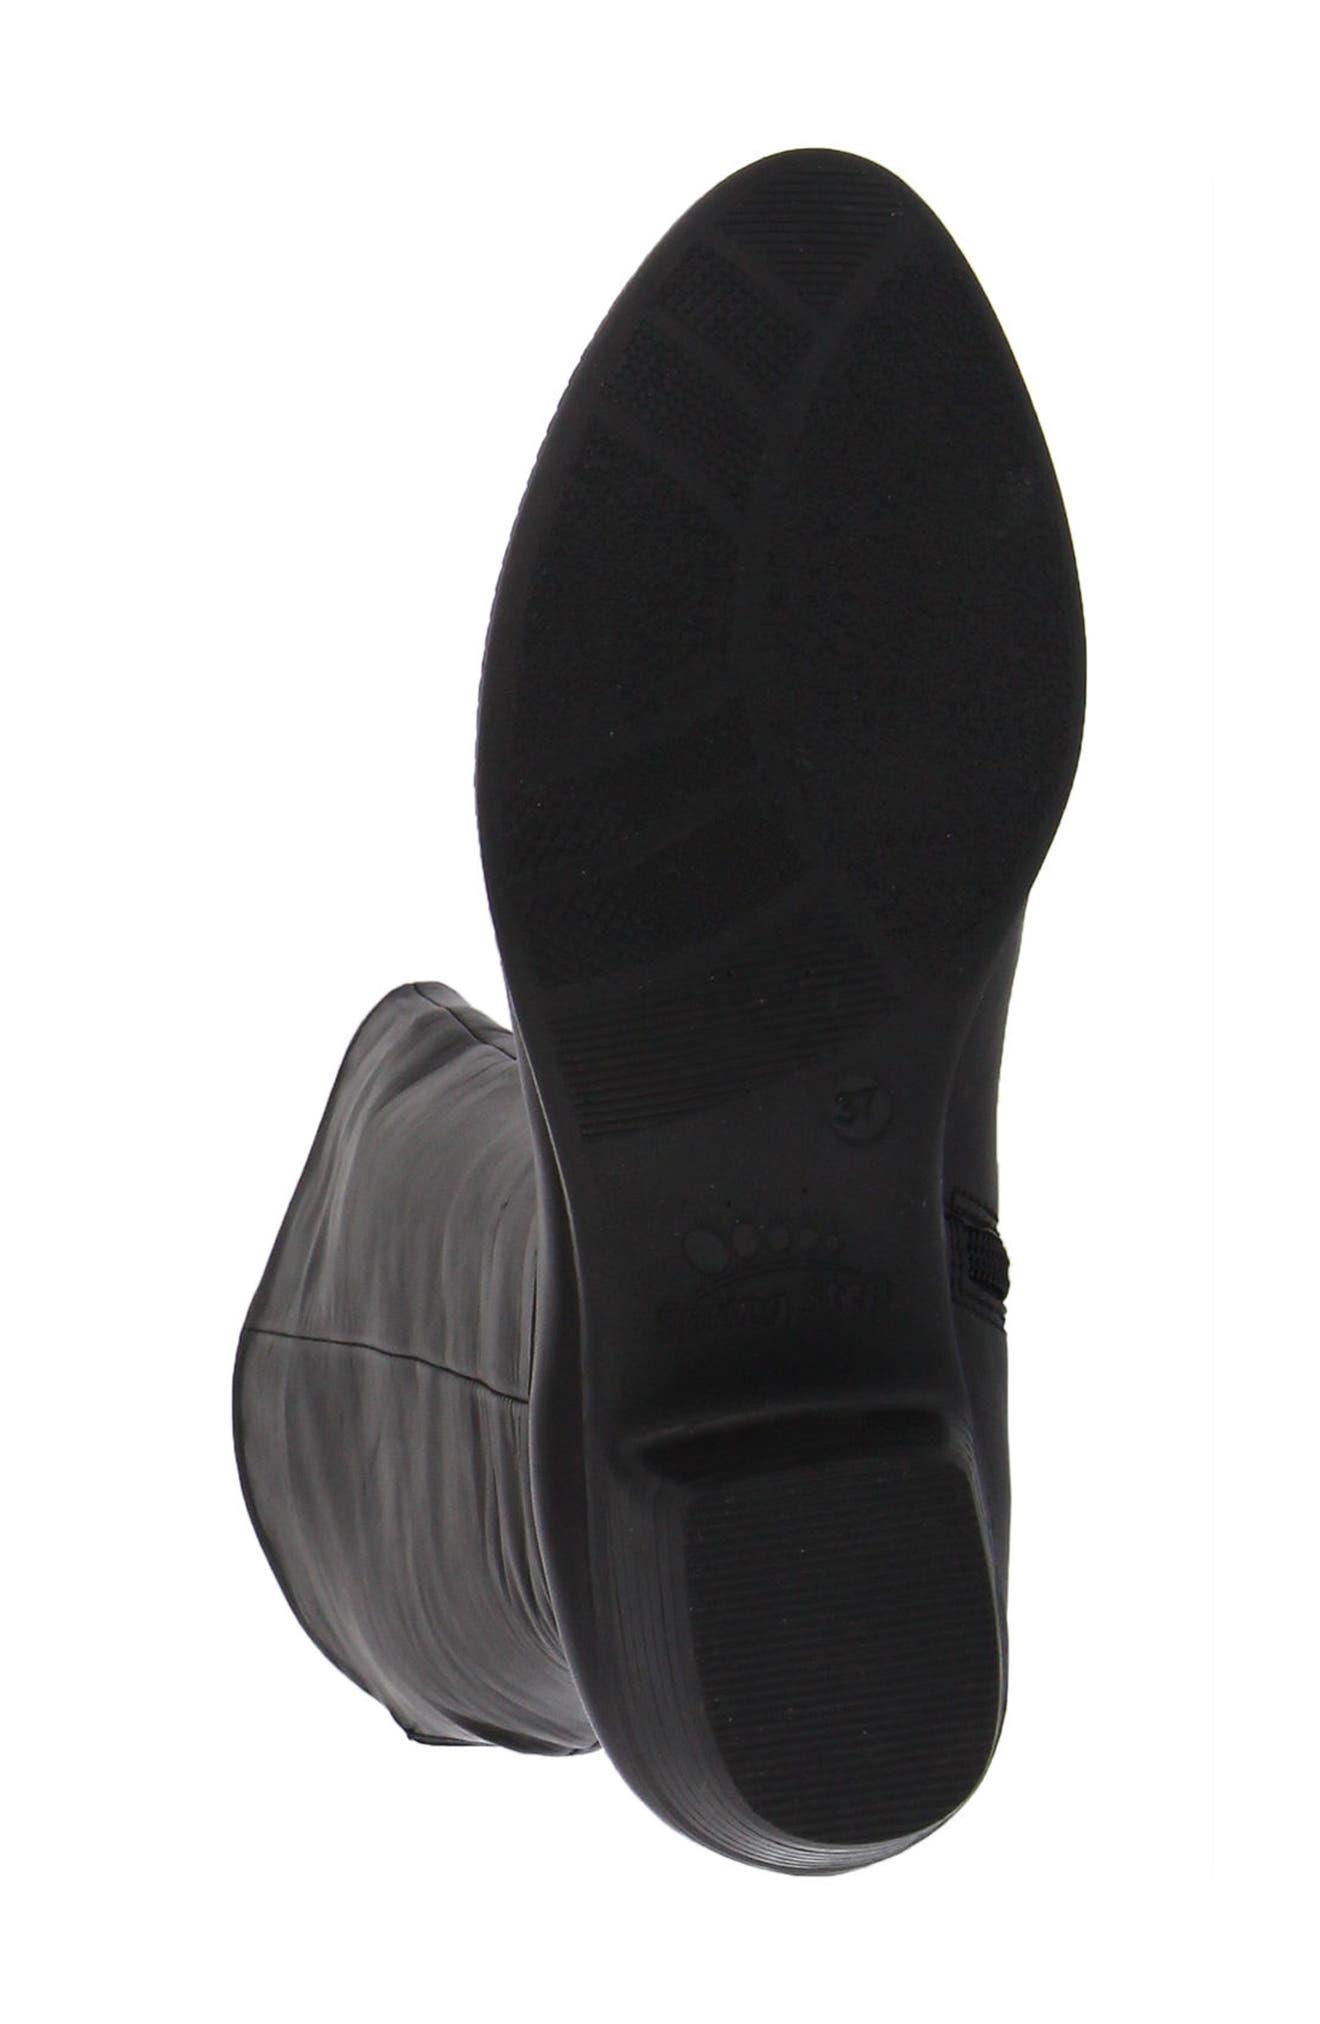 Bolah Tall Boot,                             Alternate thumbnail 5, color,                             Black Leather